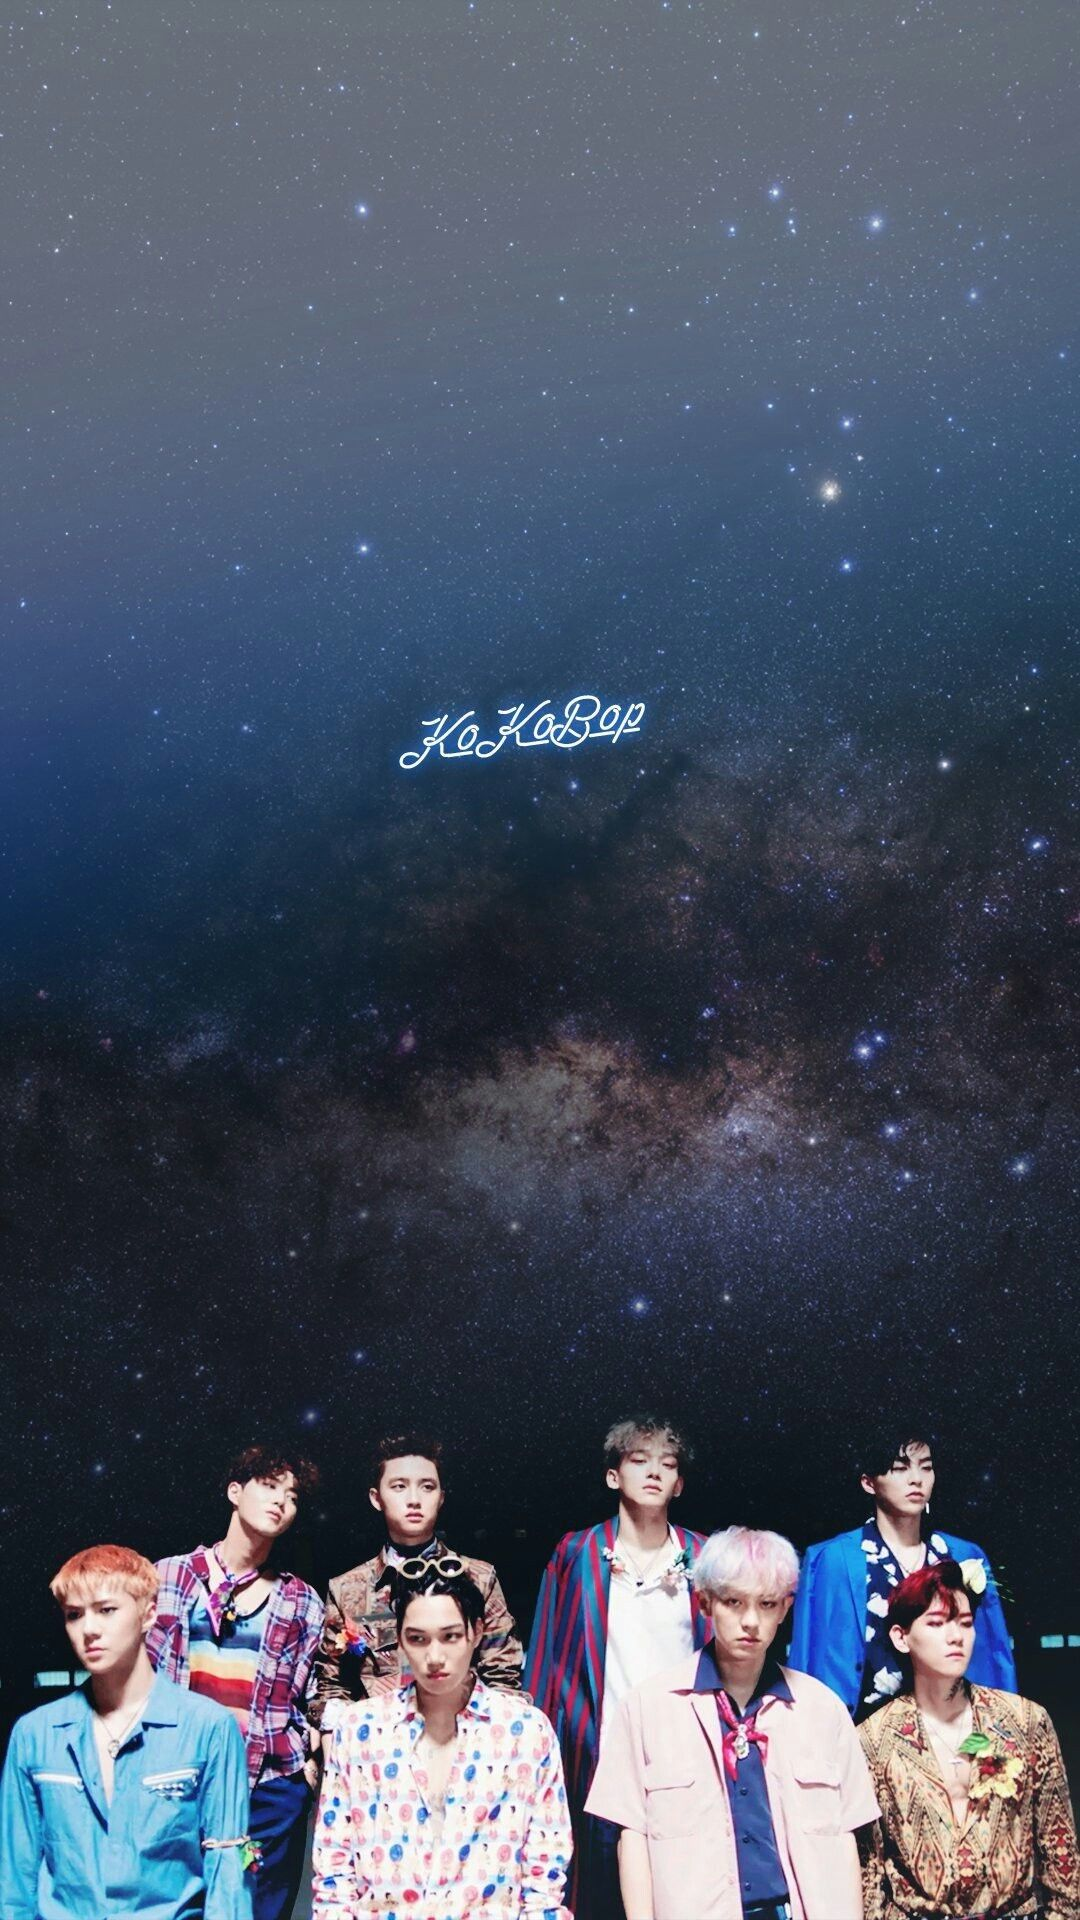 68 Exo Hd Wallpapers On Wallpaperplay Exo Lockscreen Exo Kokobop Exo